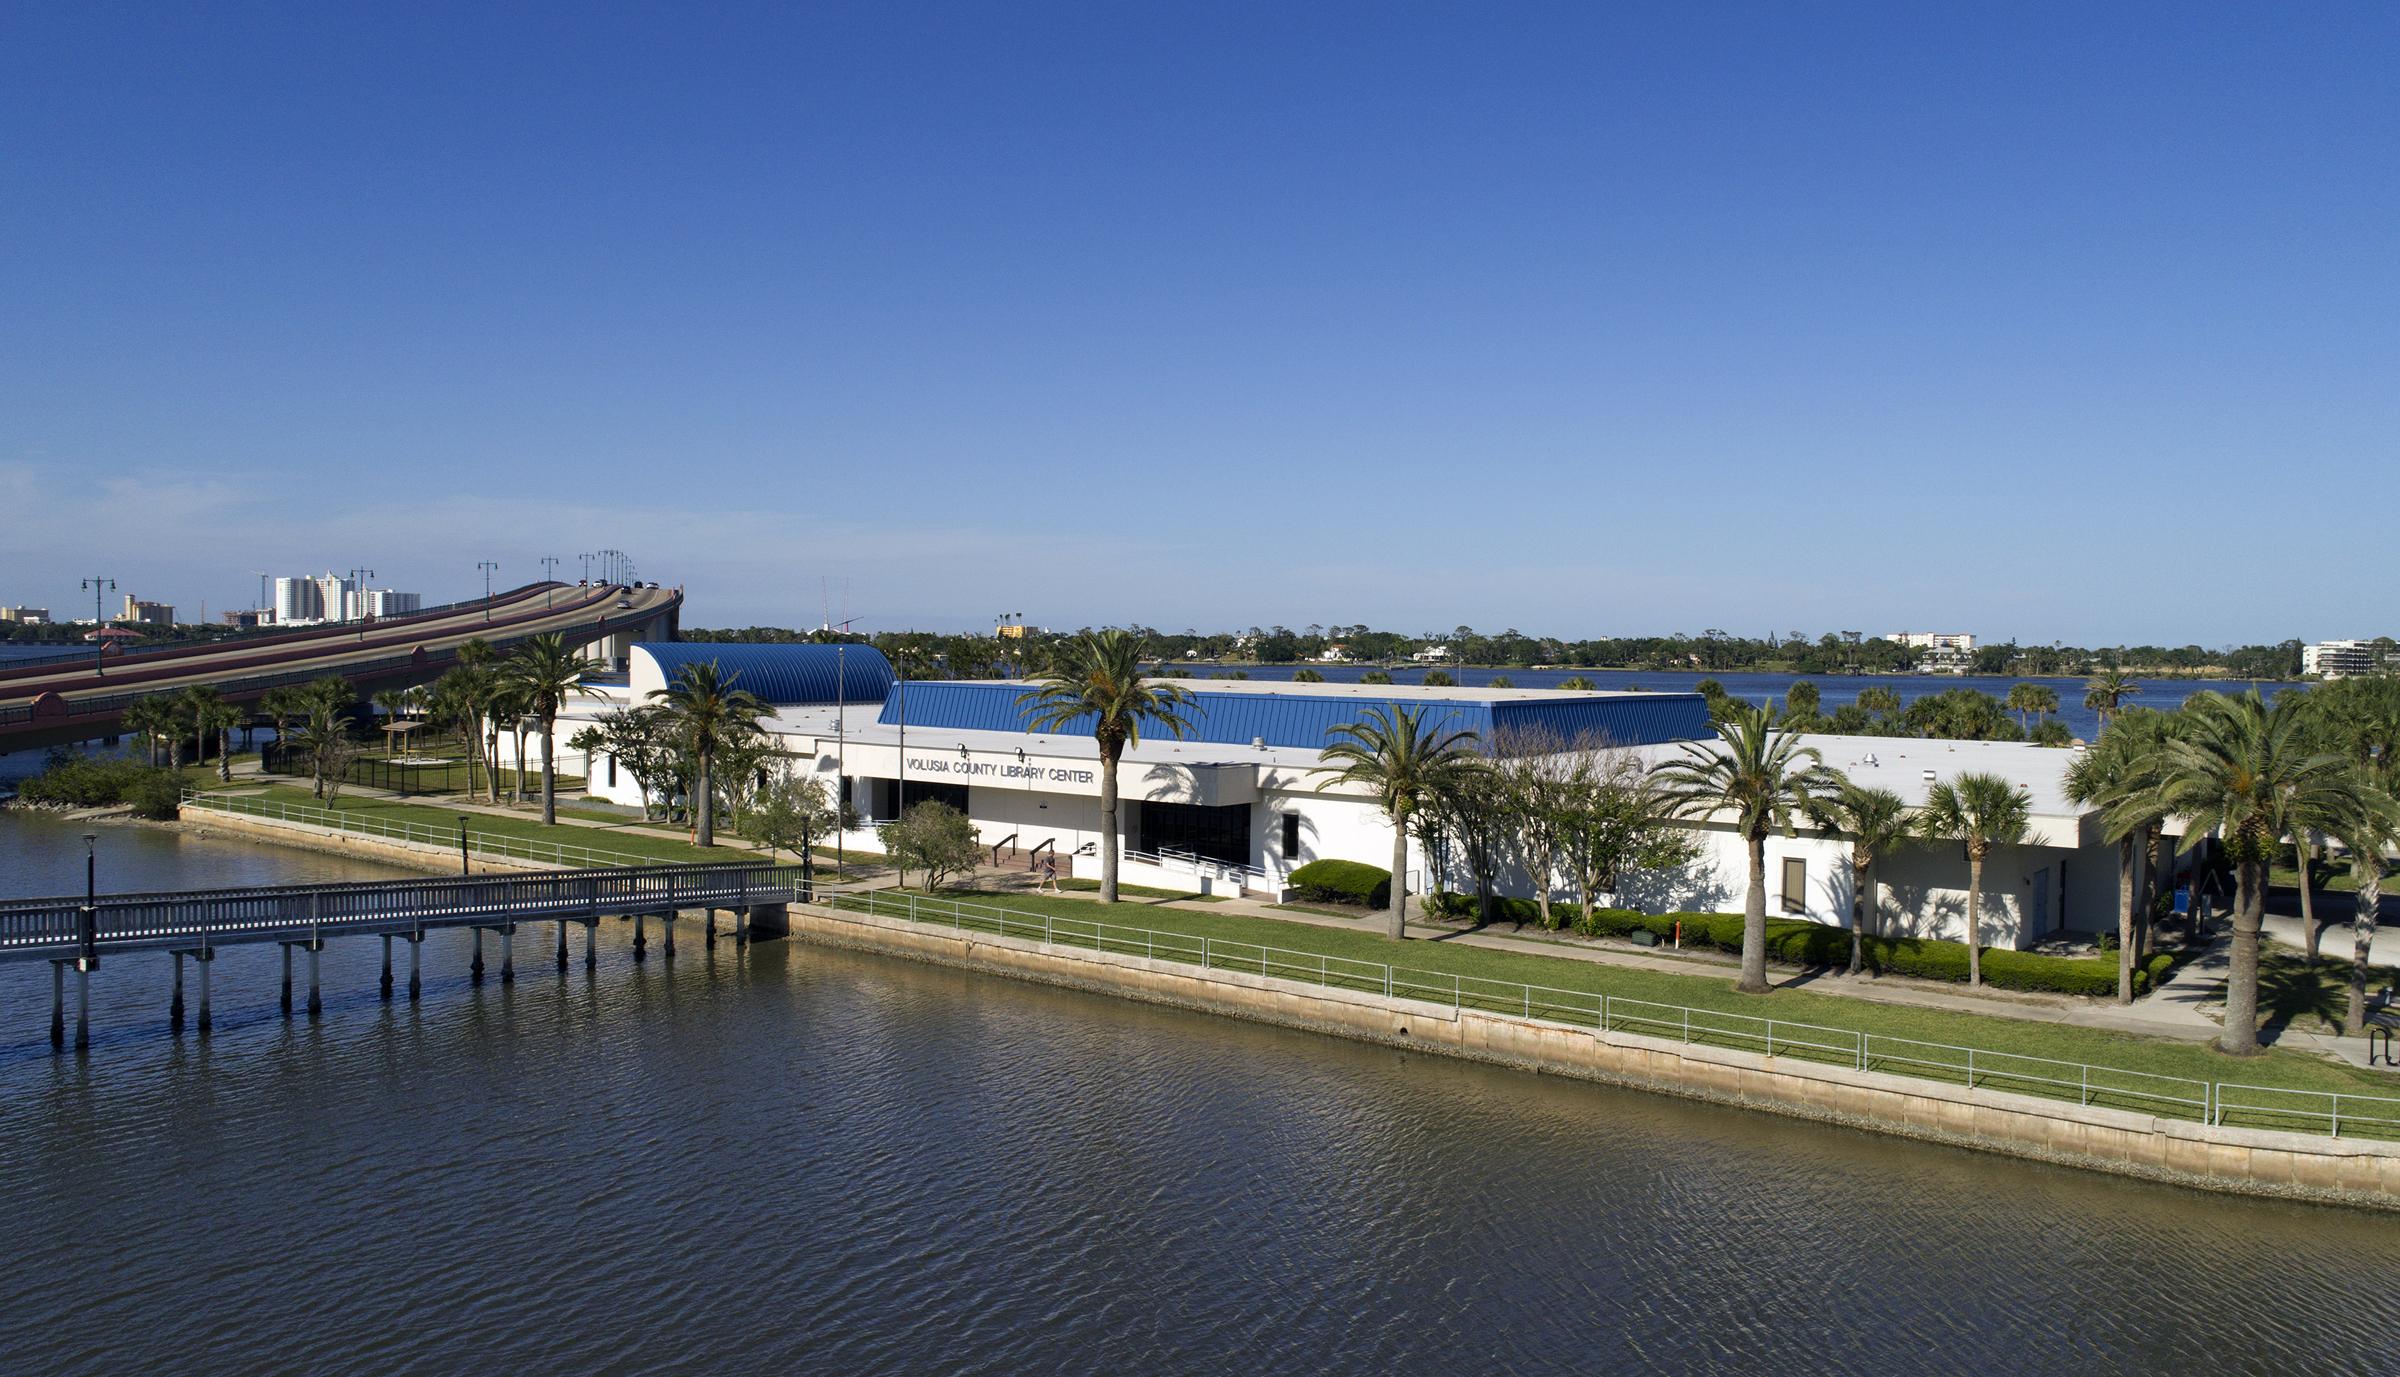 Daytona Beach Regional Library